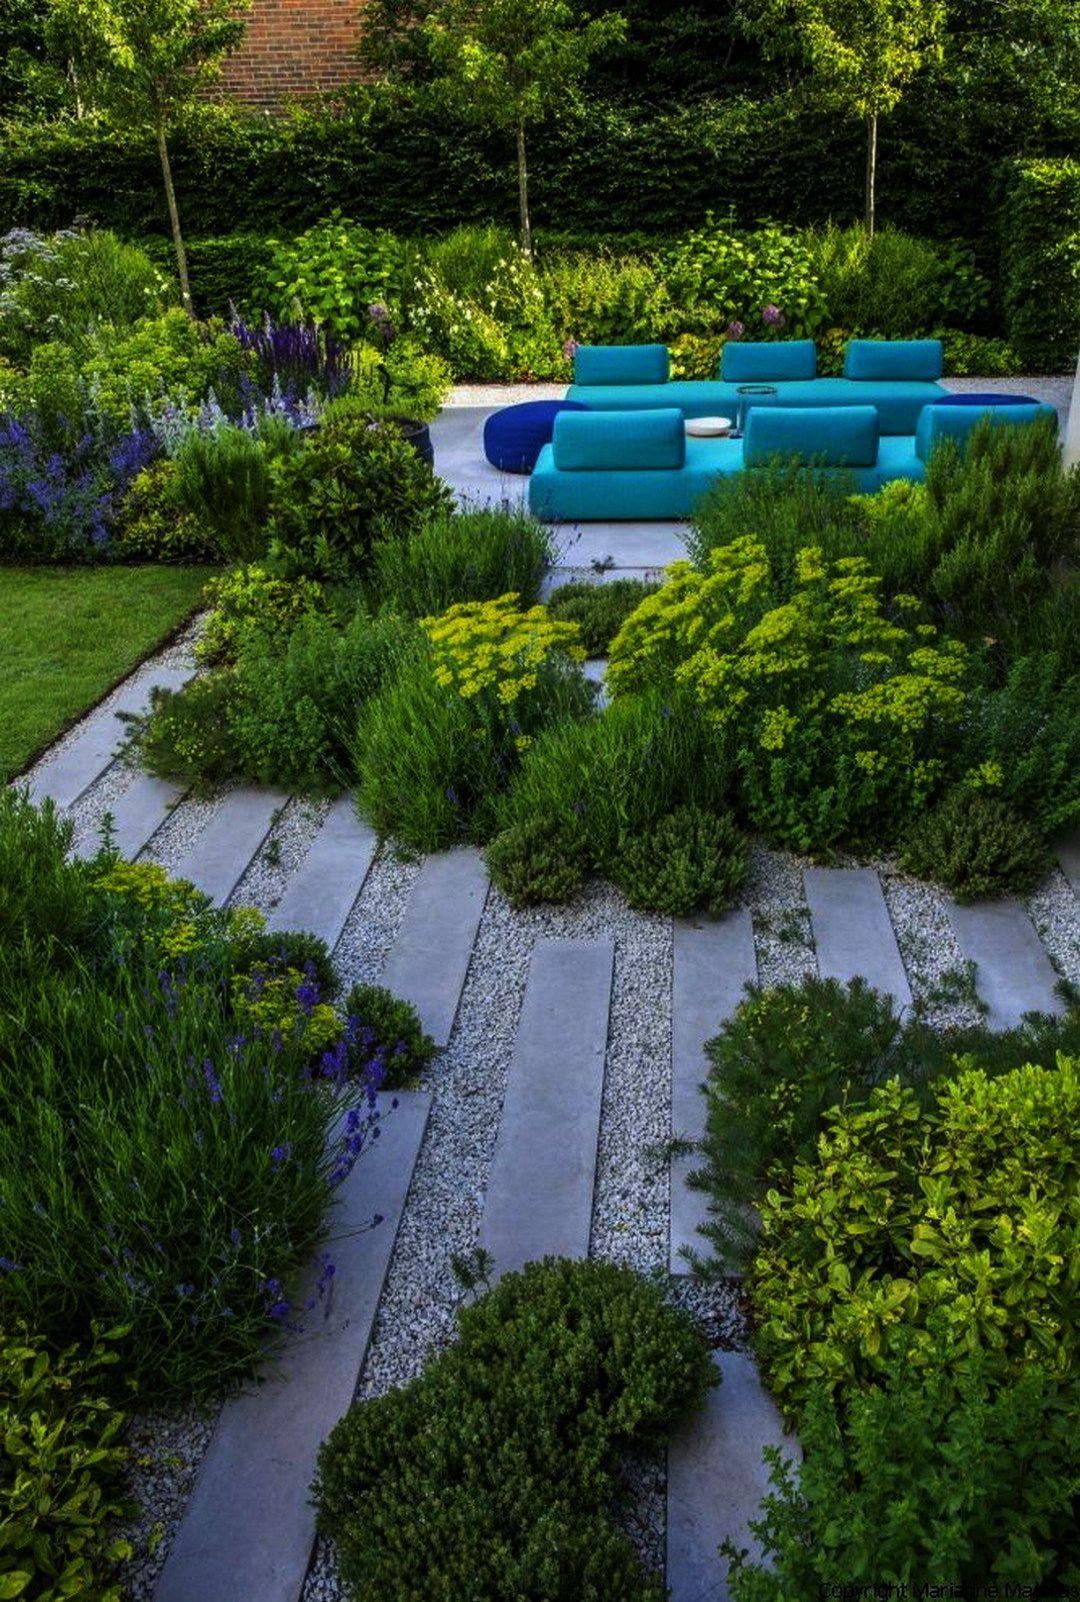 Landscape Gardening Jobs Along With Landscape Gardening Course London Under Landscap Modern Landschapsontwerp Modern Tuinontwerp Landschapsarchitectuur Ontwerp